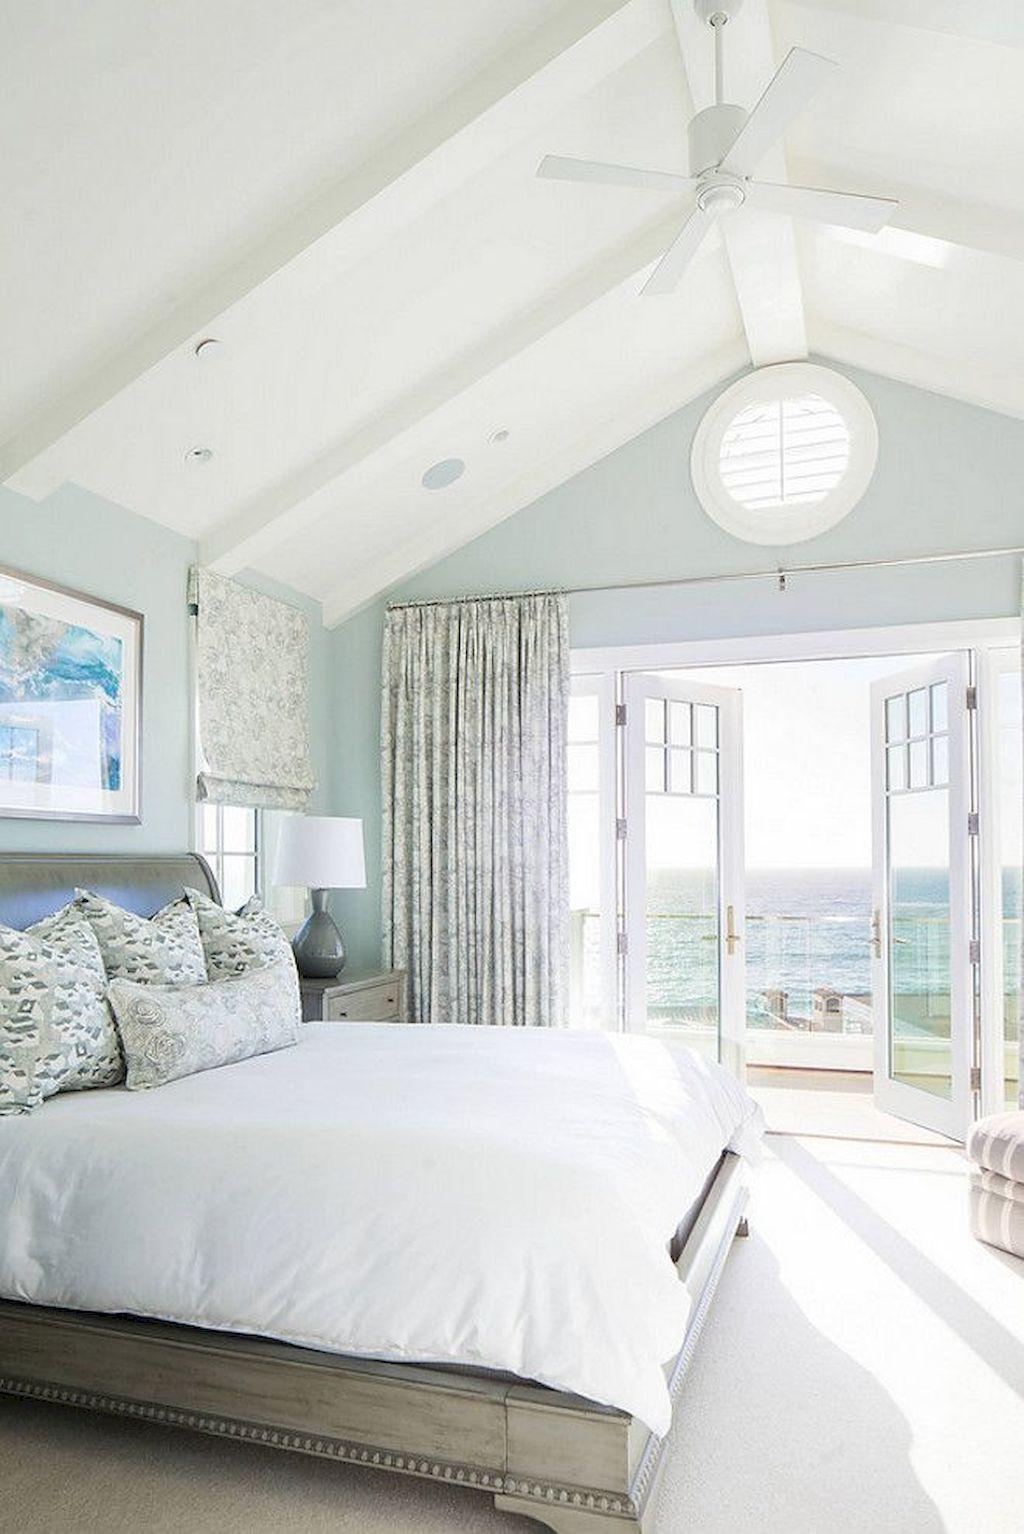 Setyouroom Com Nbspsetyouroom Resources And Information Lakehouse Bedroom Beach House Bedroom Beach House Interior